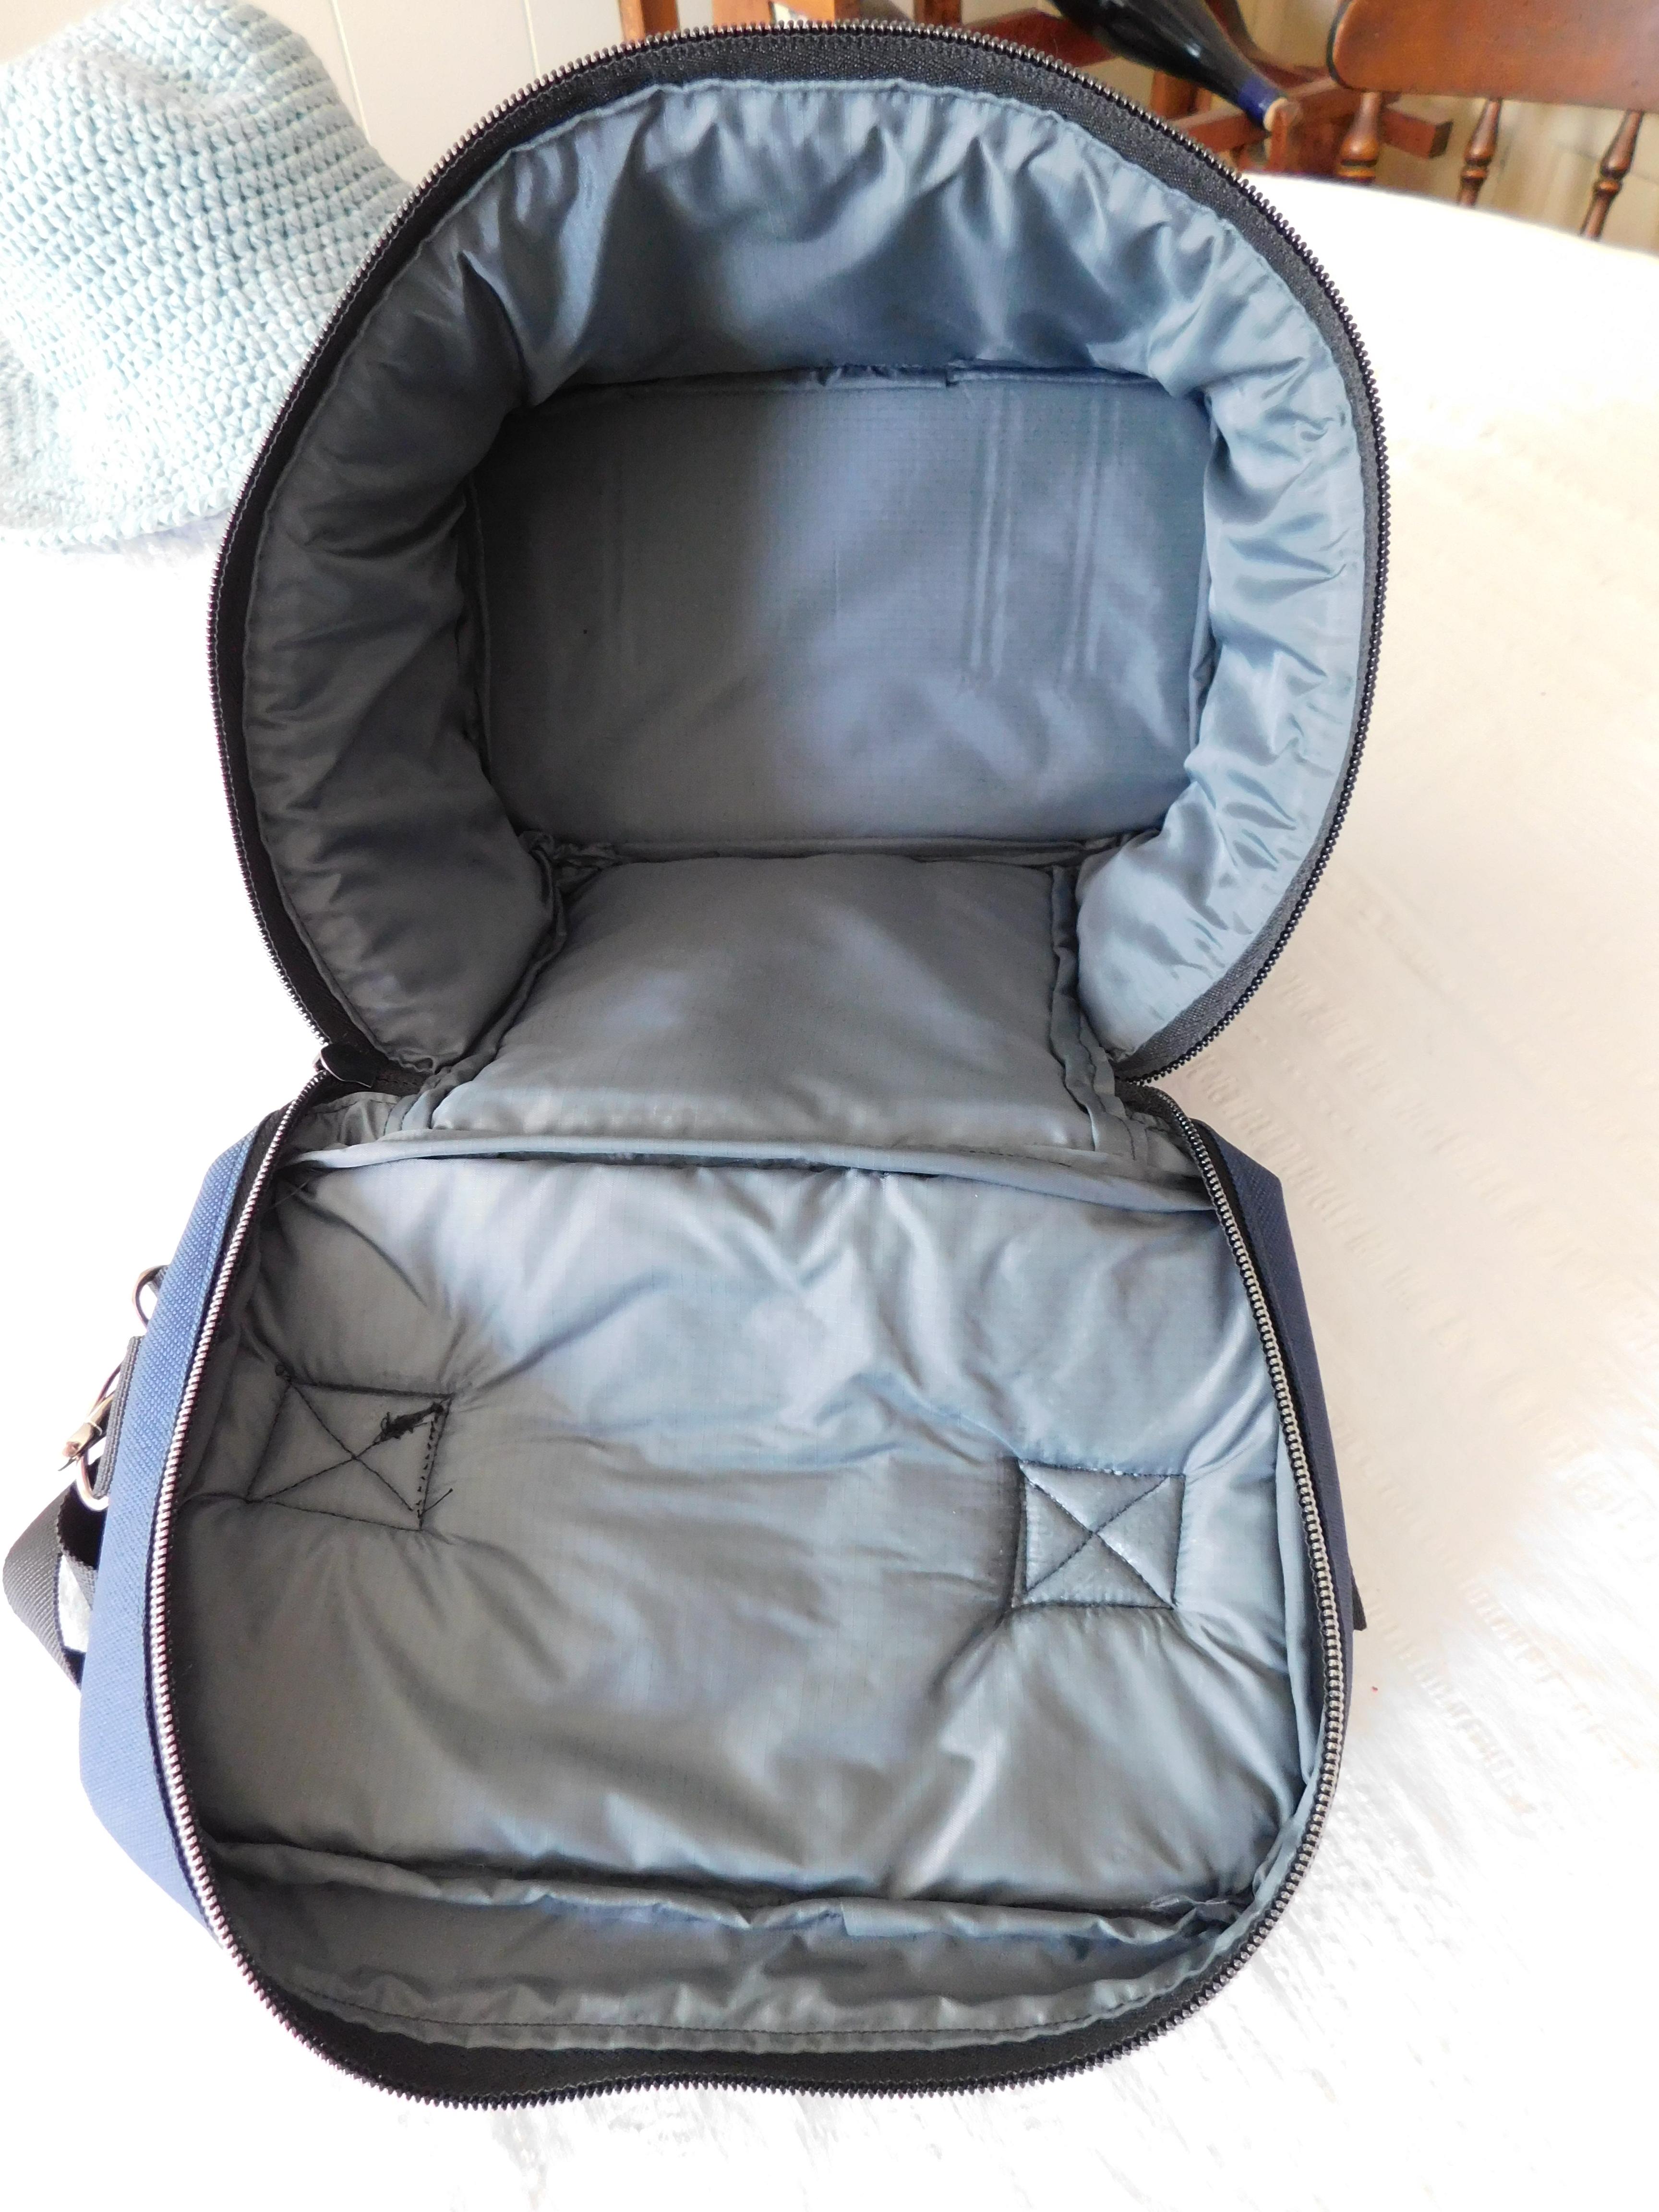 Lunch Bag Inside